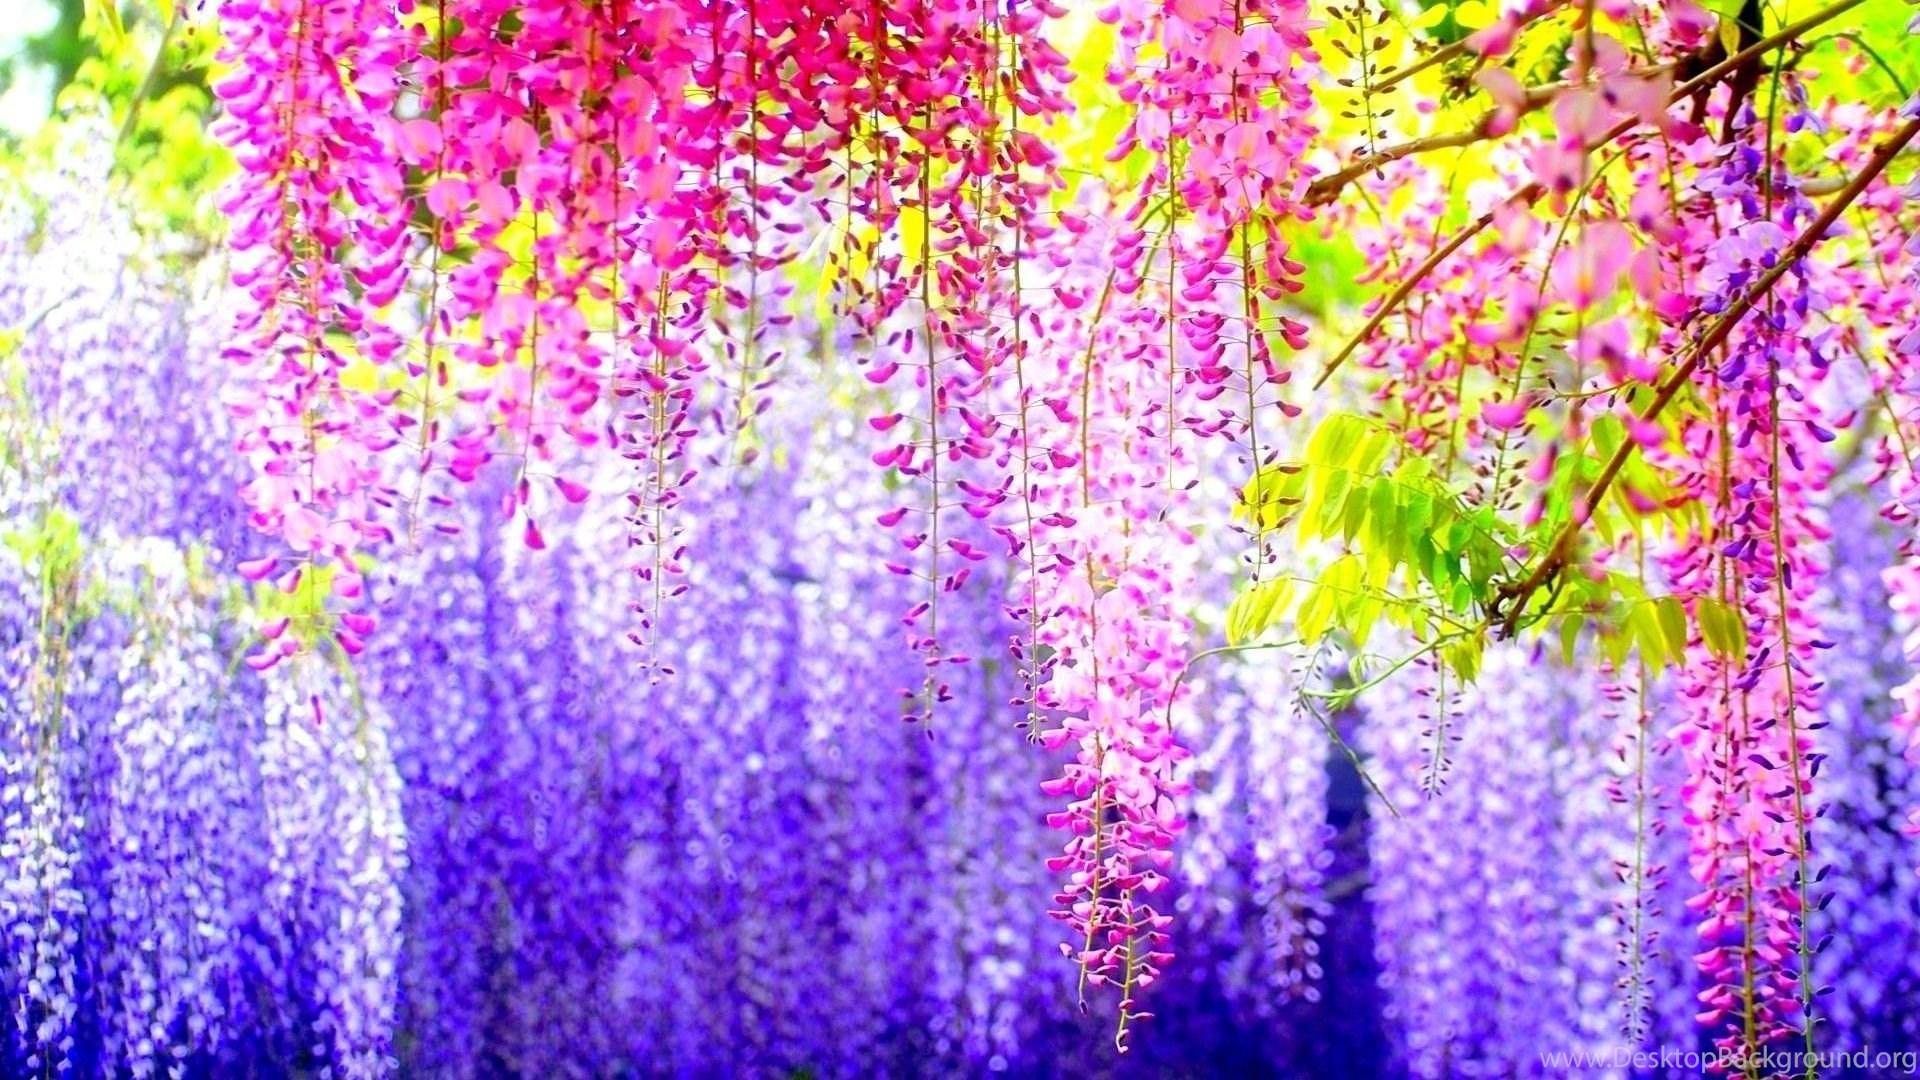 Pretty Flower Backgrounds Hd Wallpapers Desktop Wallpapers